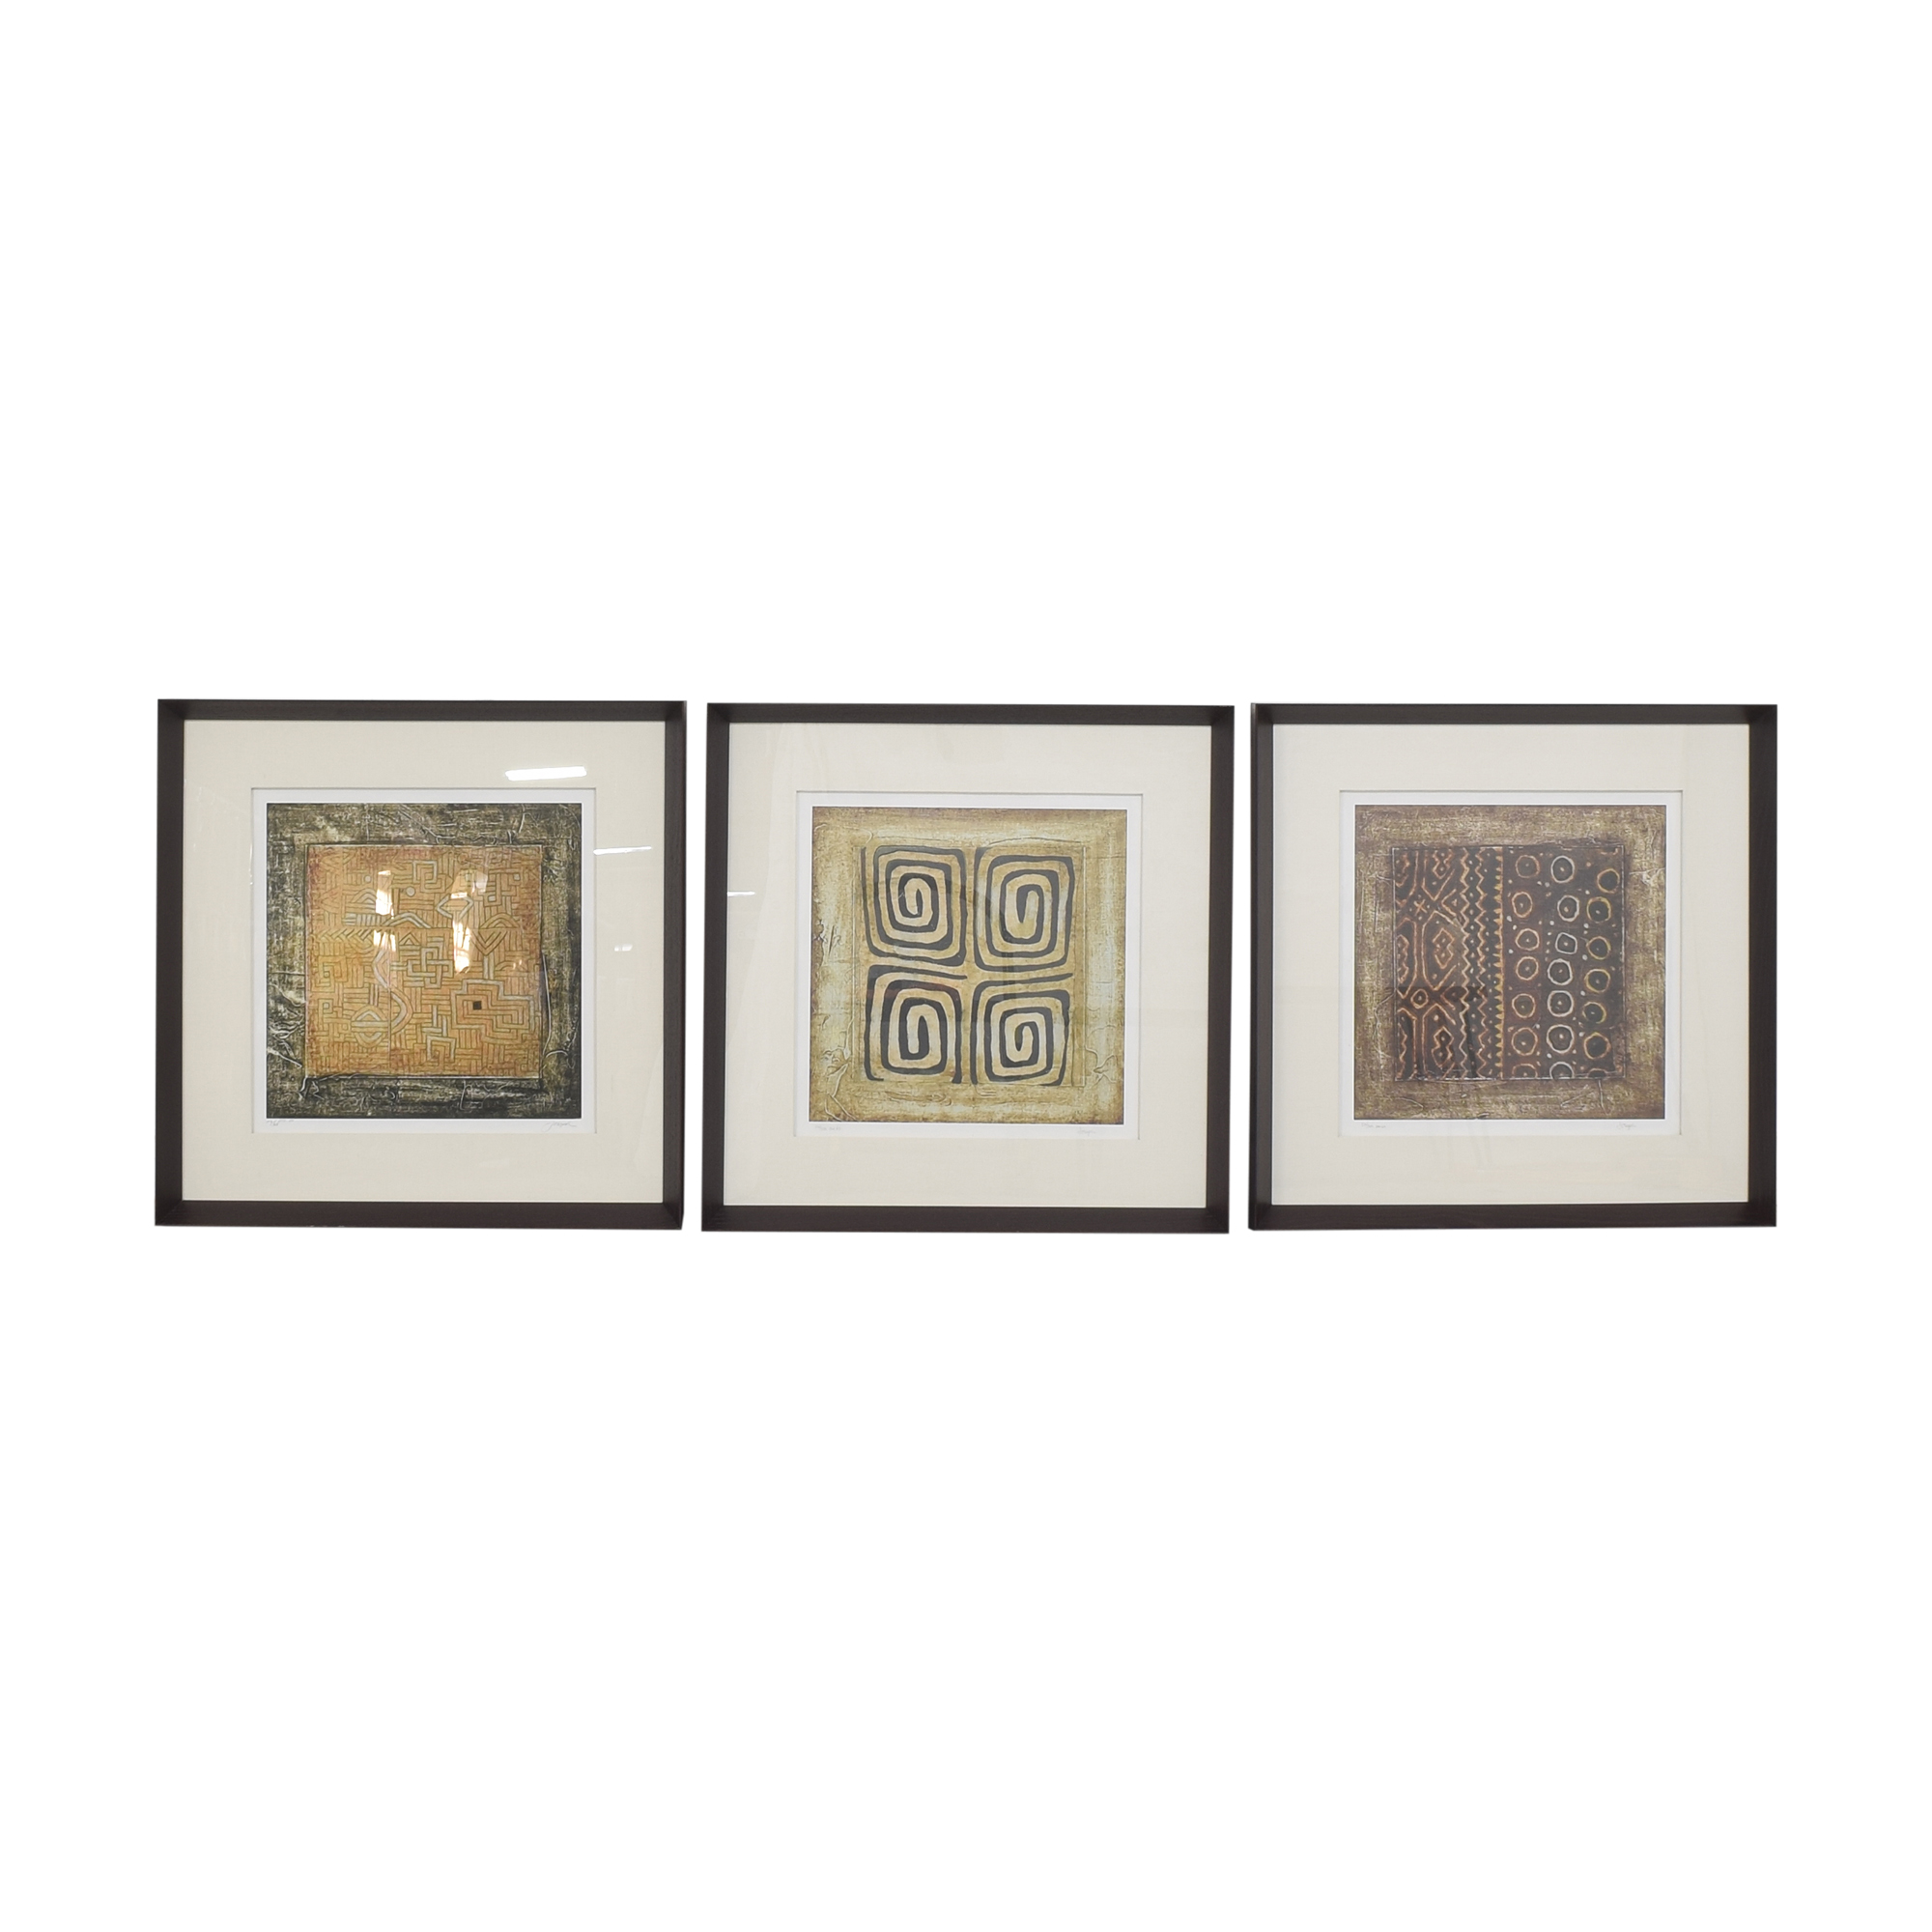 Ethan Allen Ethan Allen Cameroon Triptych Wall Art nyc